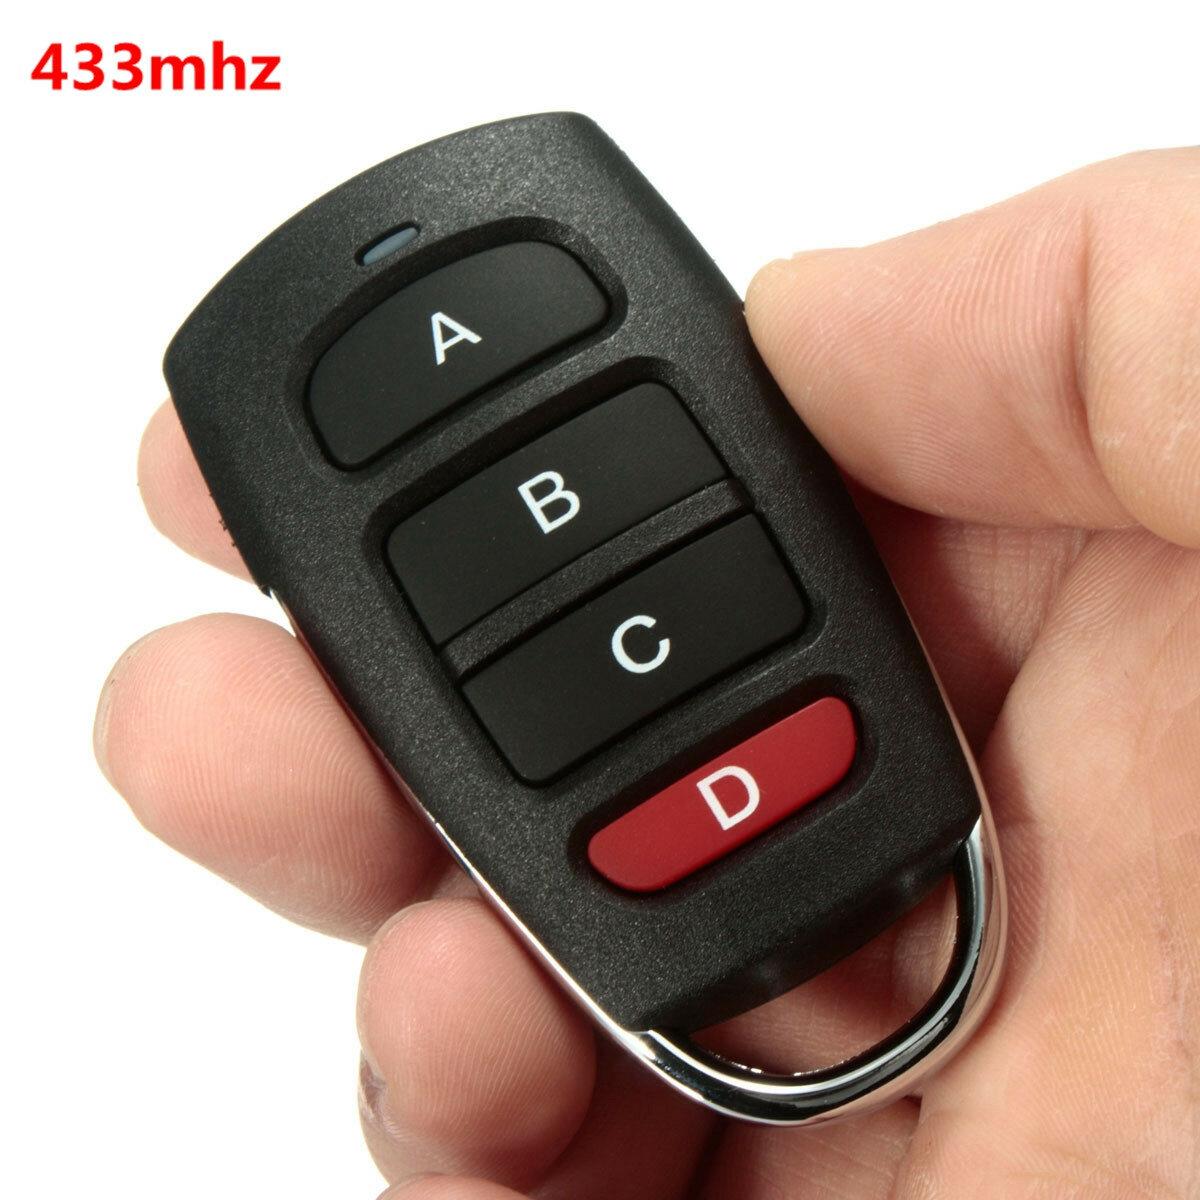 Universal Cloning Cloner 433mhz Electric Gate Garage Door Remote Control Key Fob